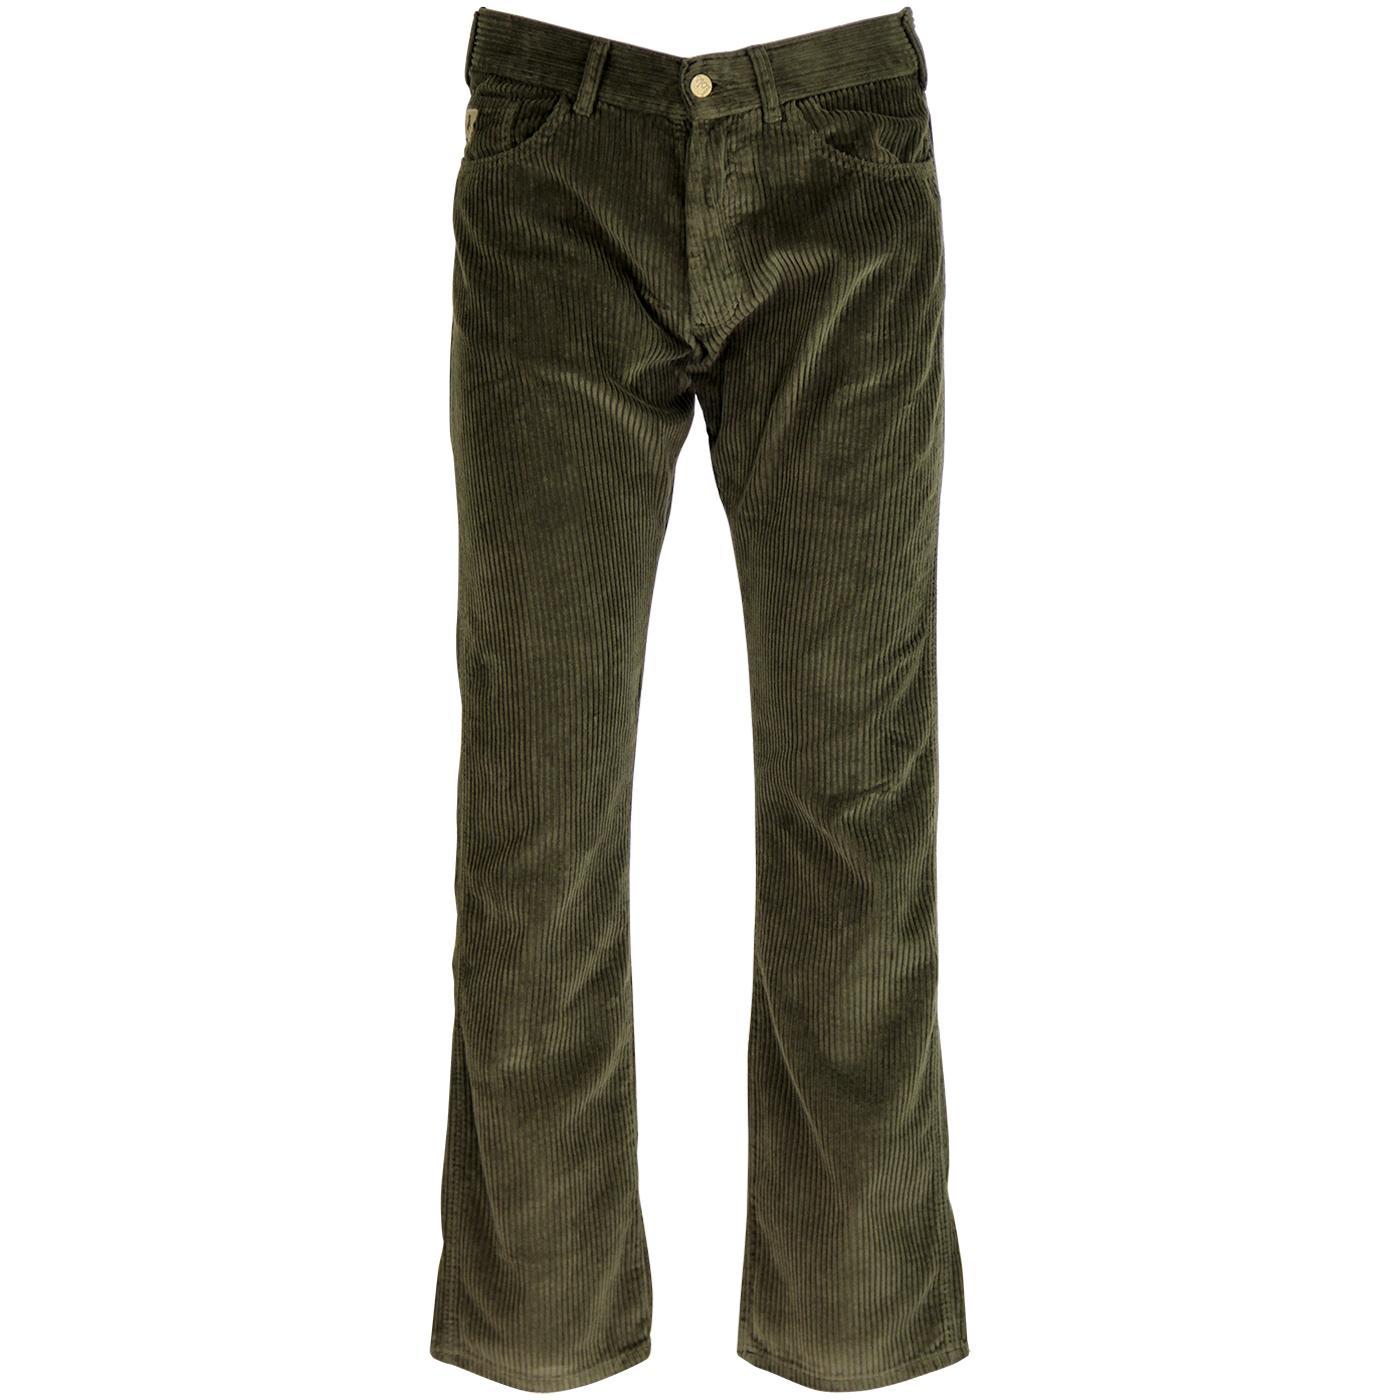 New Dallas LOIS 1980s Mod Jumbo Cord Trousers Ol